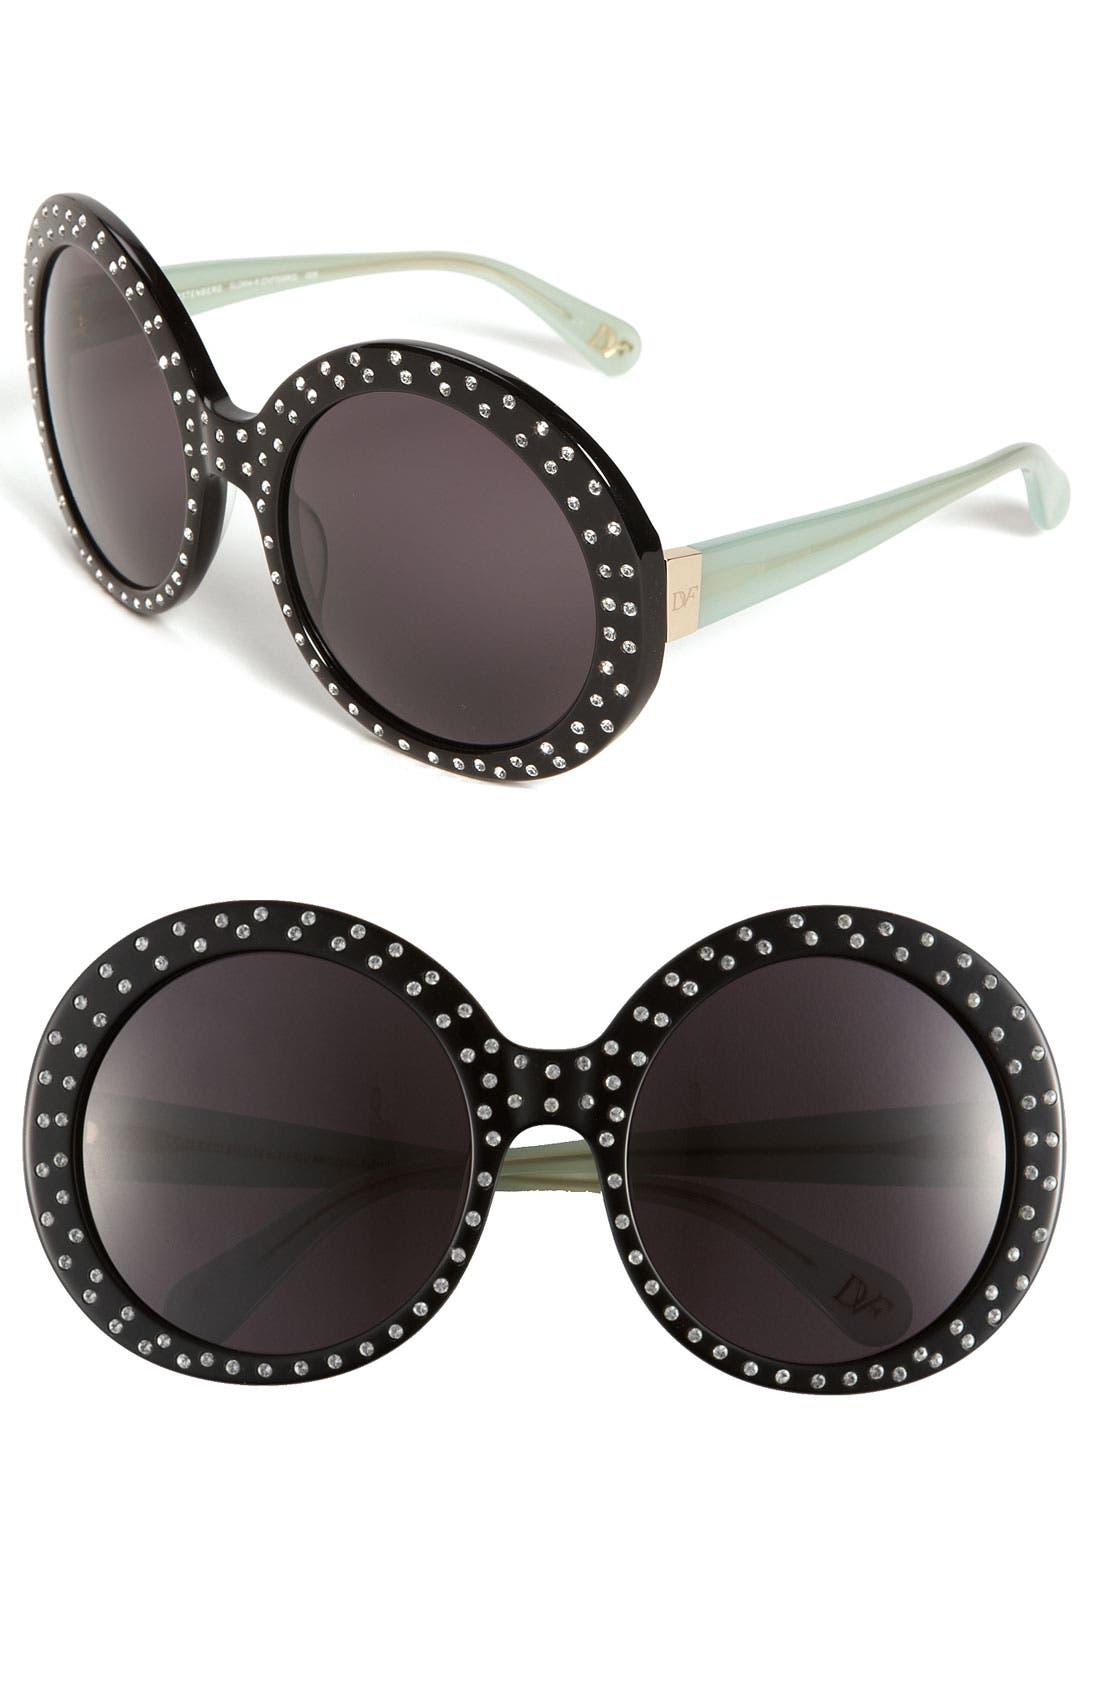 Alternate Image 1 Selected - Diane von Furstenberg 'Gloria - Oversized' Round Sunglasses